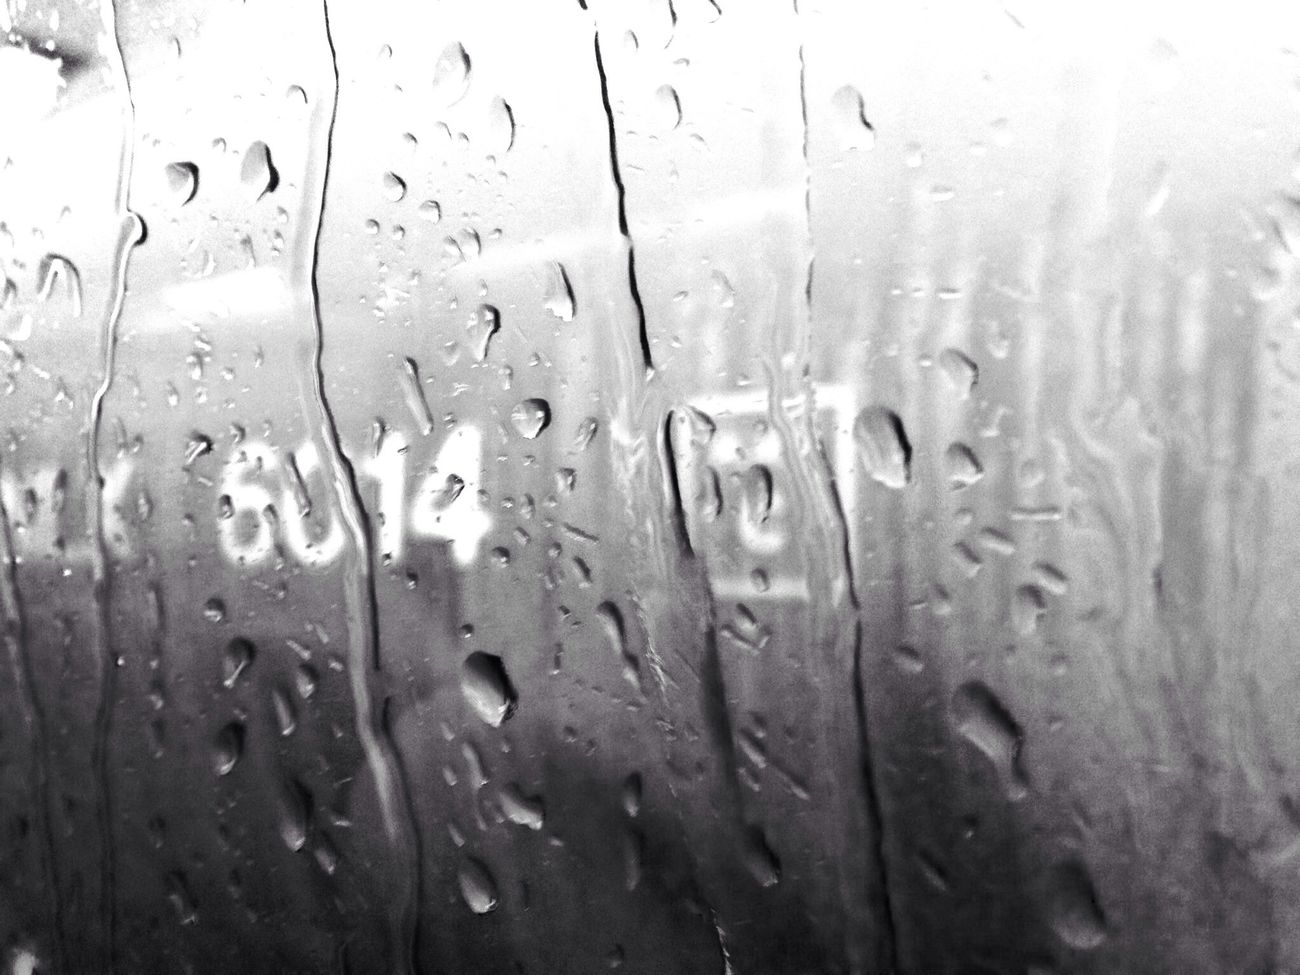 Riding The Train Rain Drops